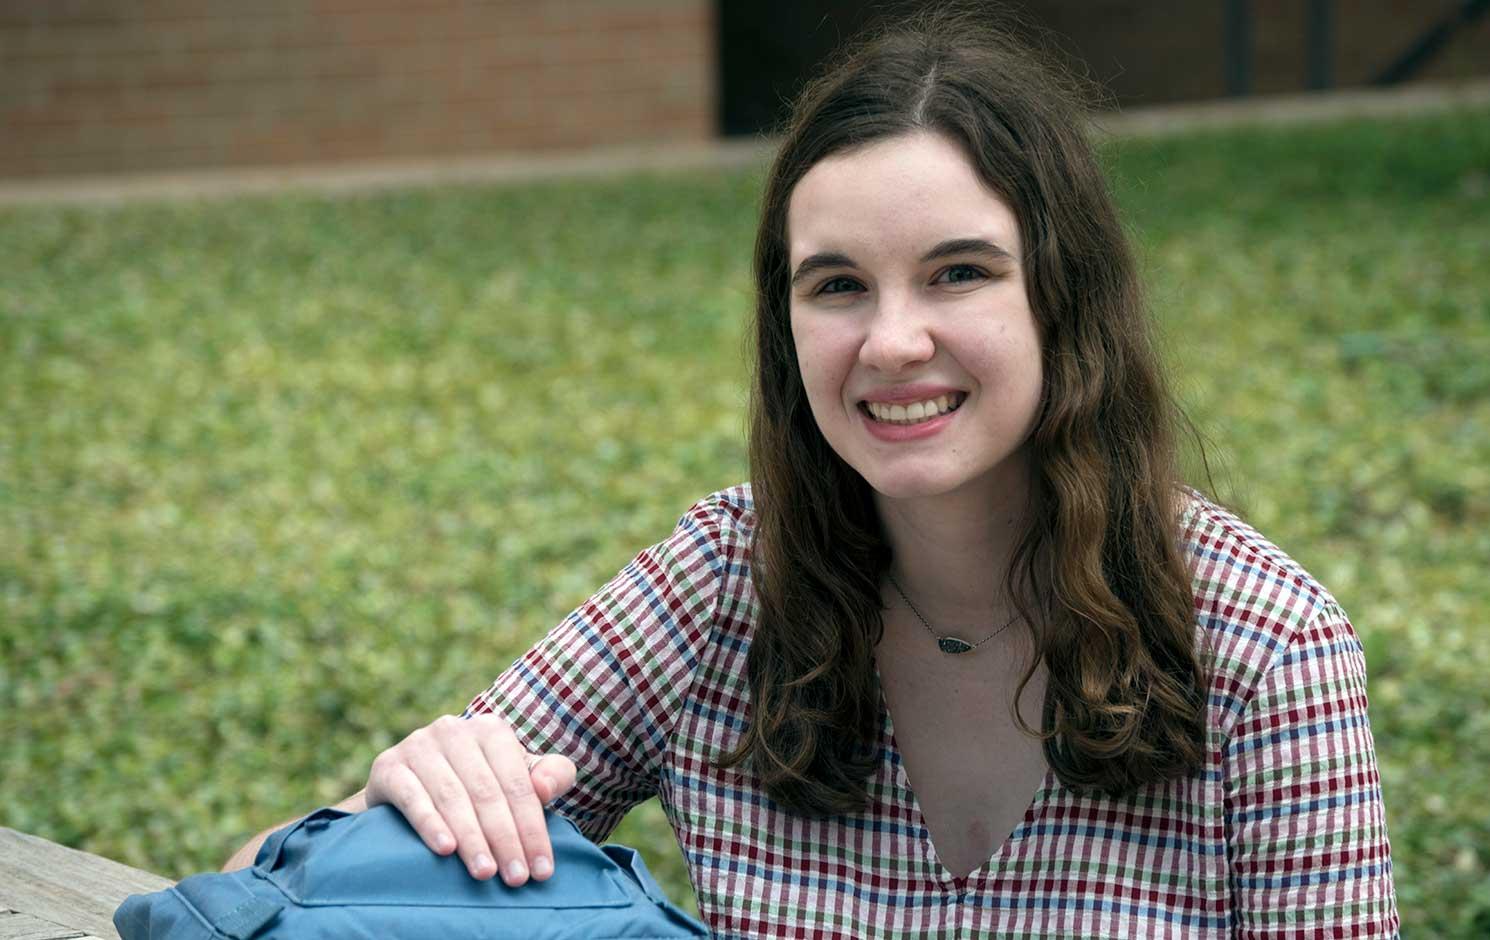 UTA electrical engineering student Amanda Losh